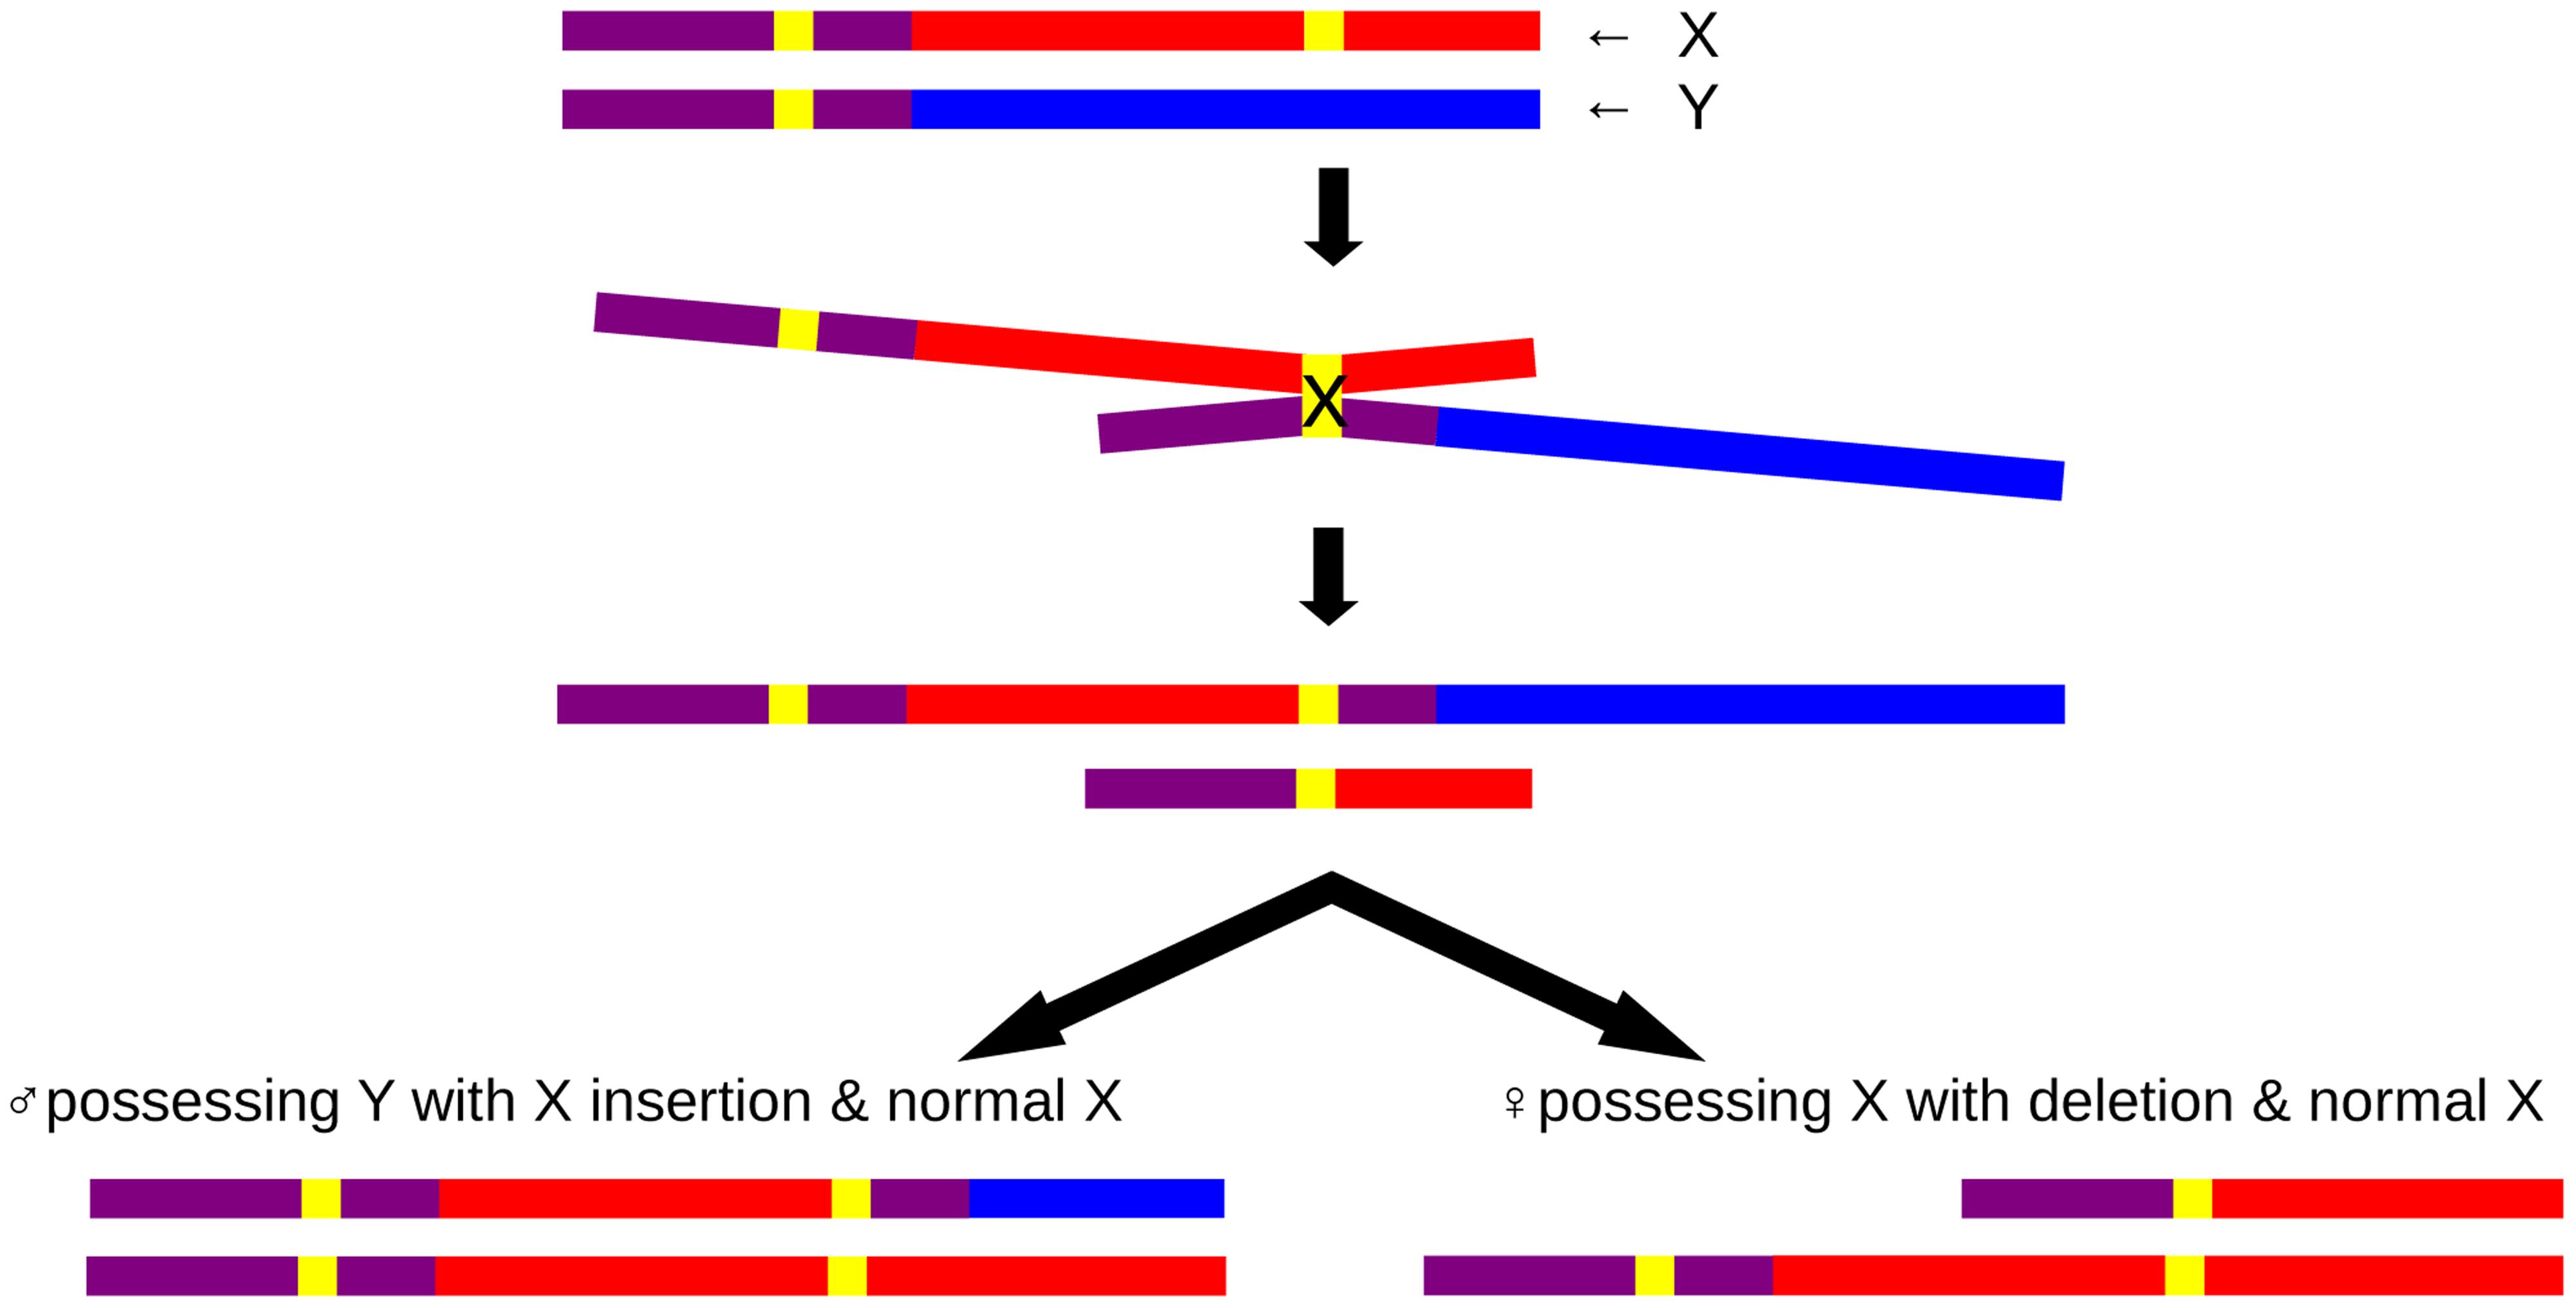 Schematic insertional translocation representation by non-allelic homologous recombination.